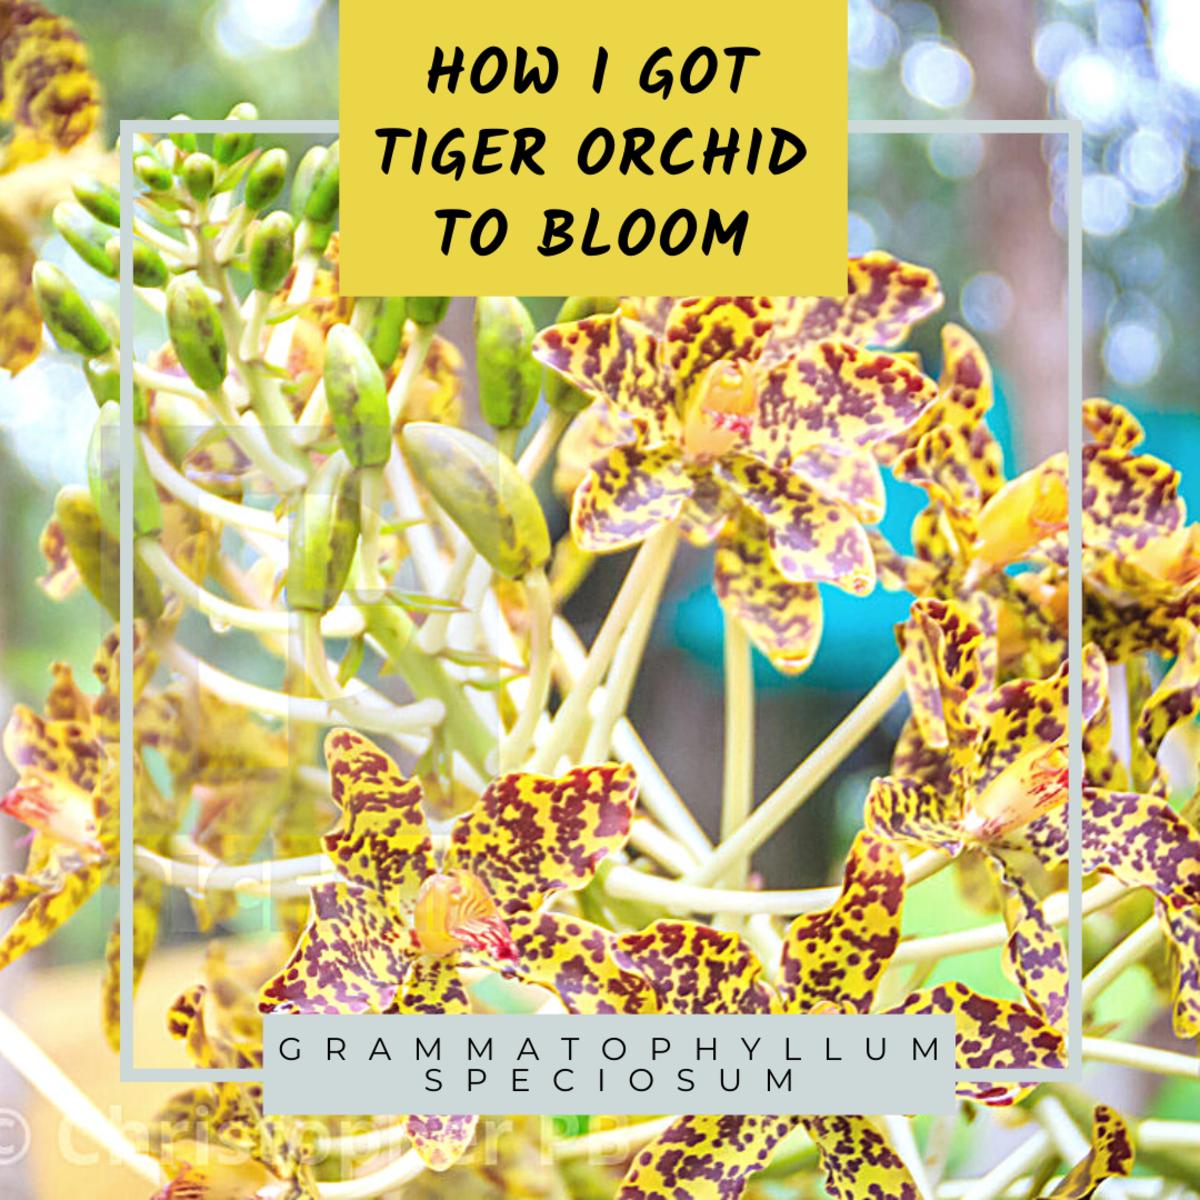 How I Got Tiger Orchid or Grammatophyllum Speciosum Plant To Bloom